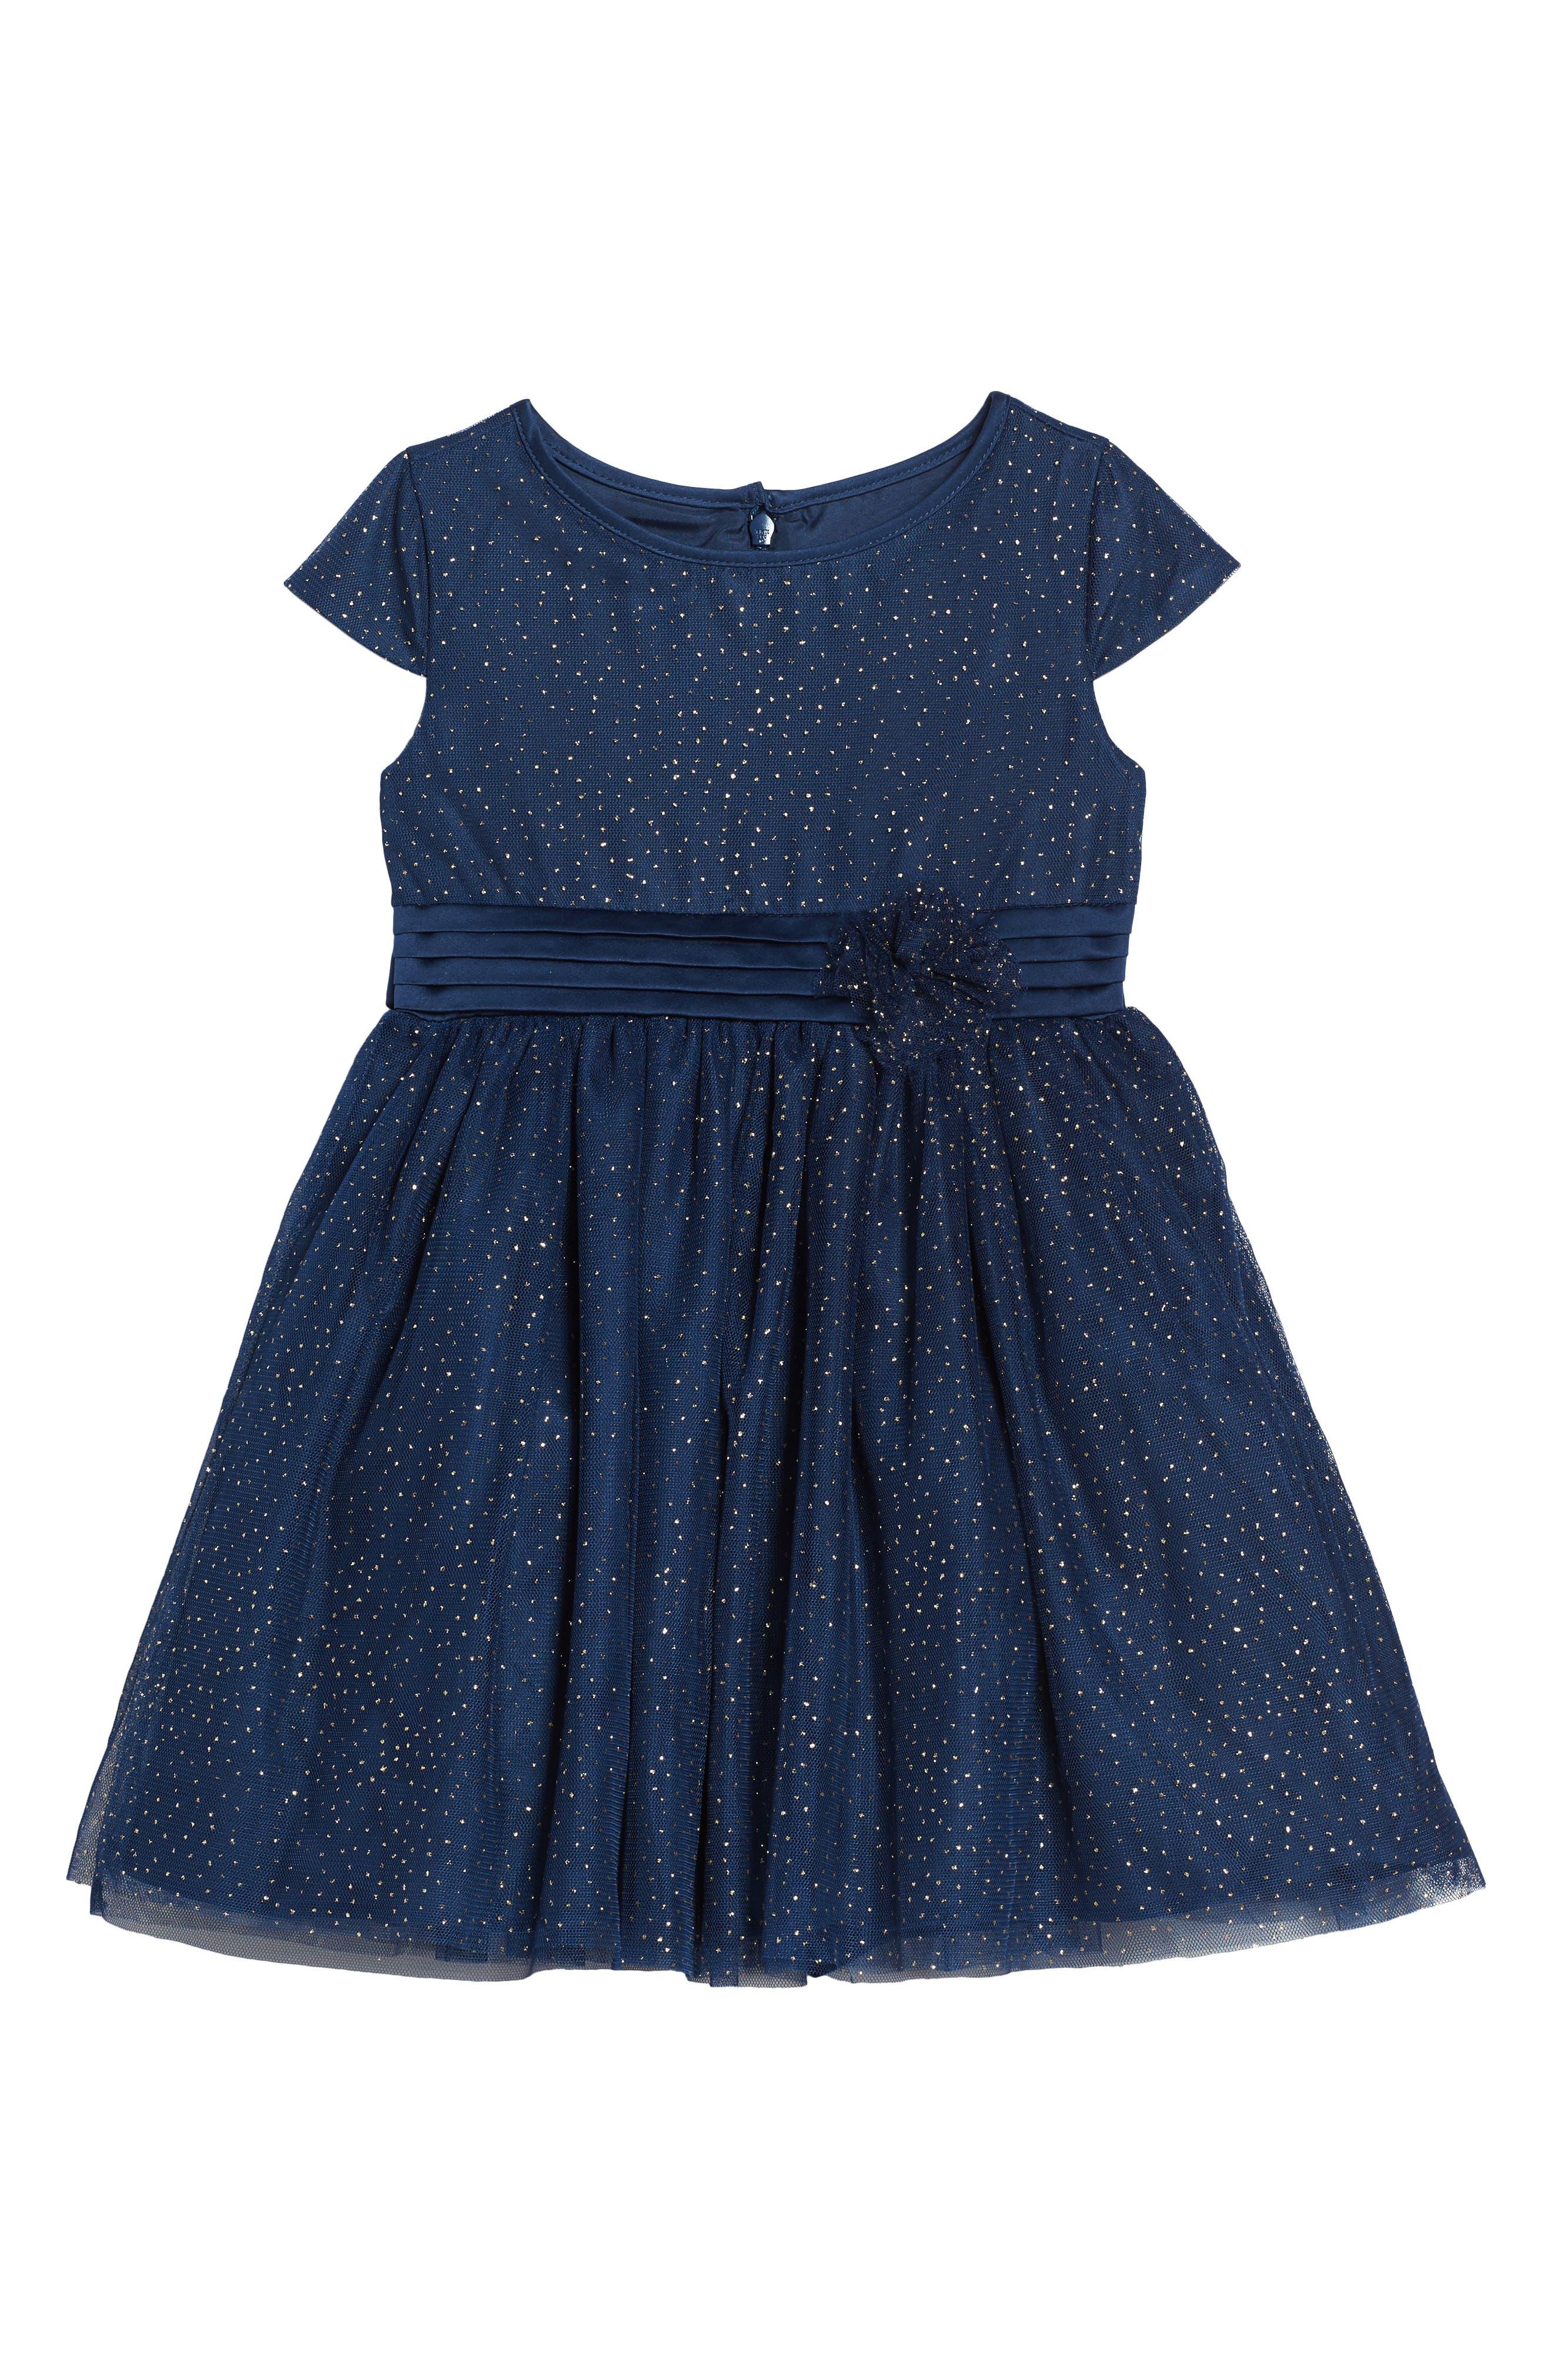 Little Angels Illusion Mesh Party Dress (Toddler Girls & Little Girls)